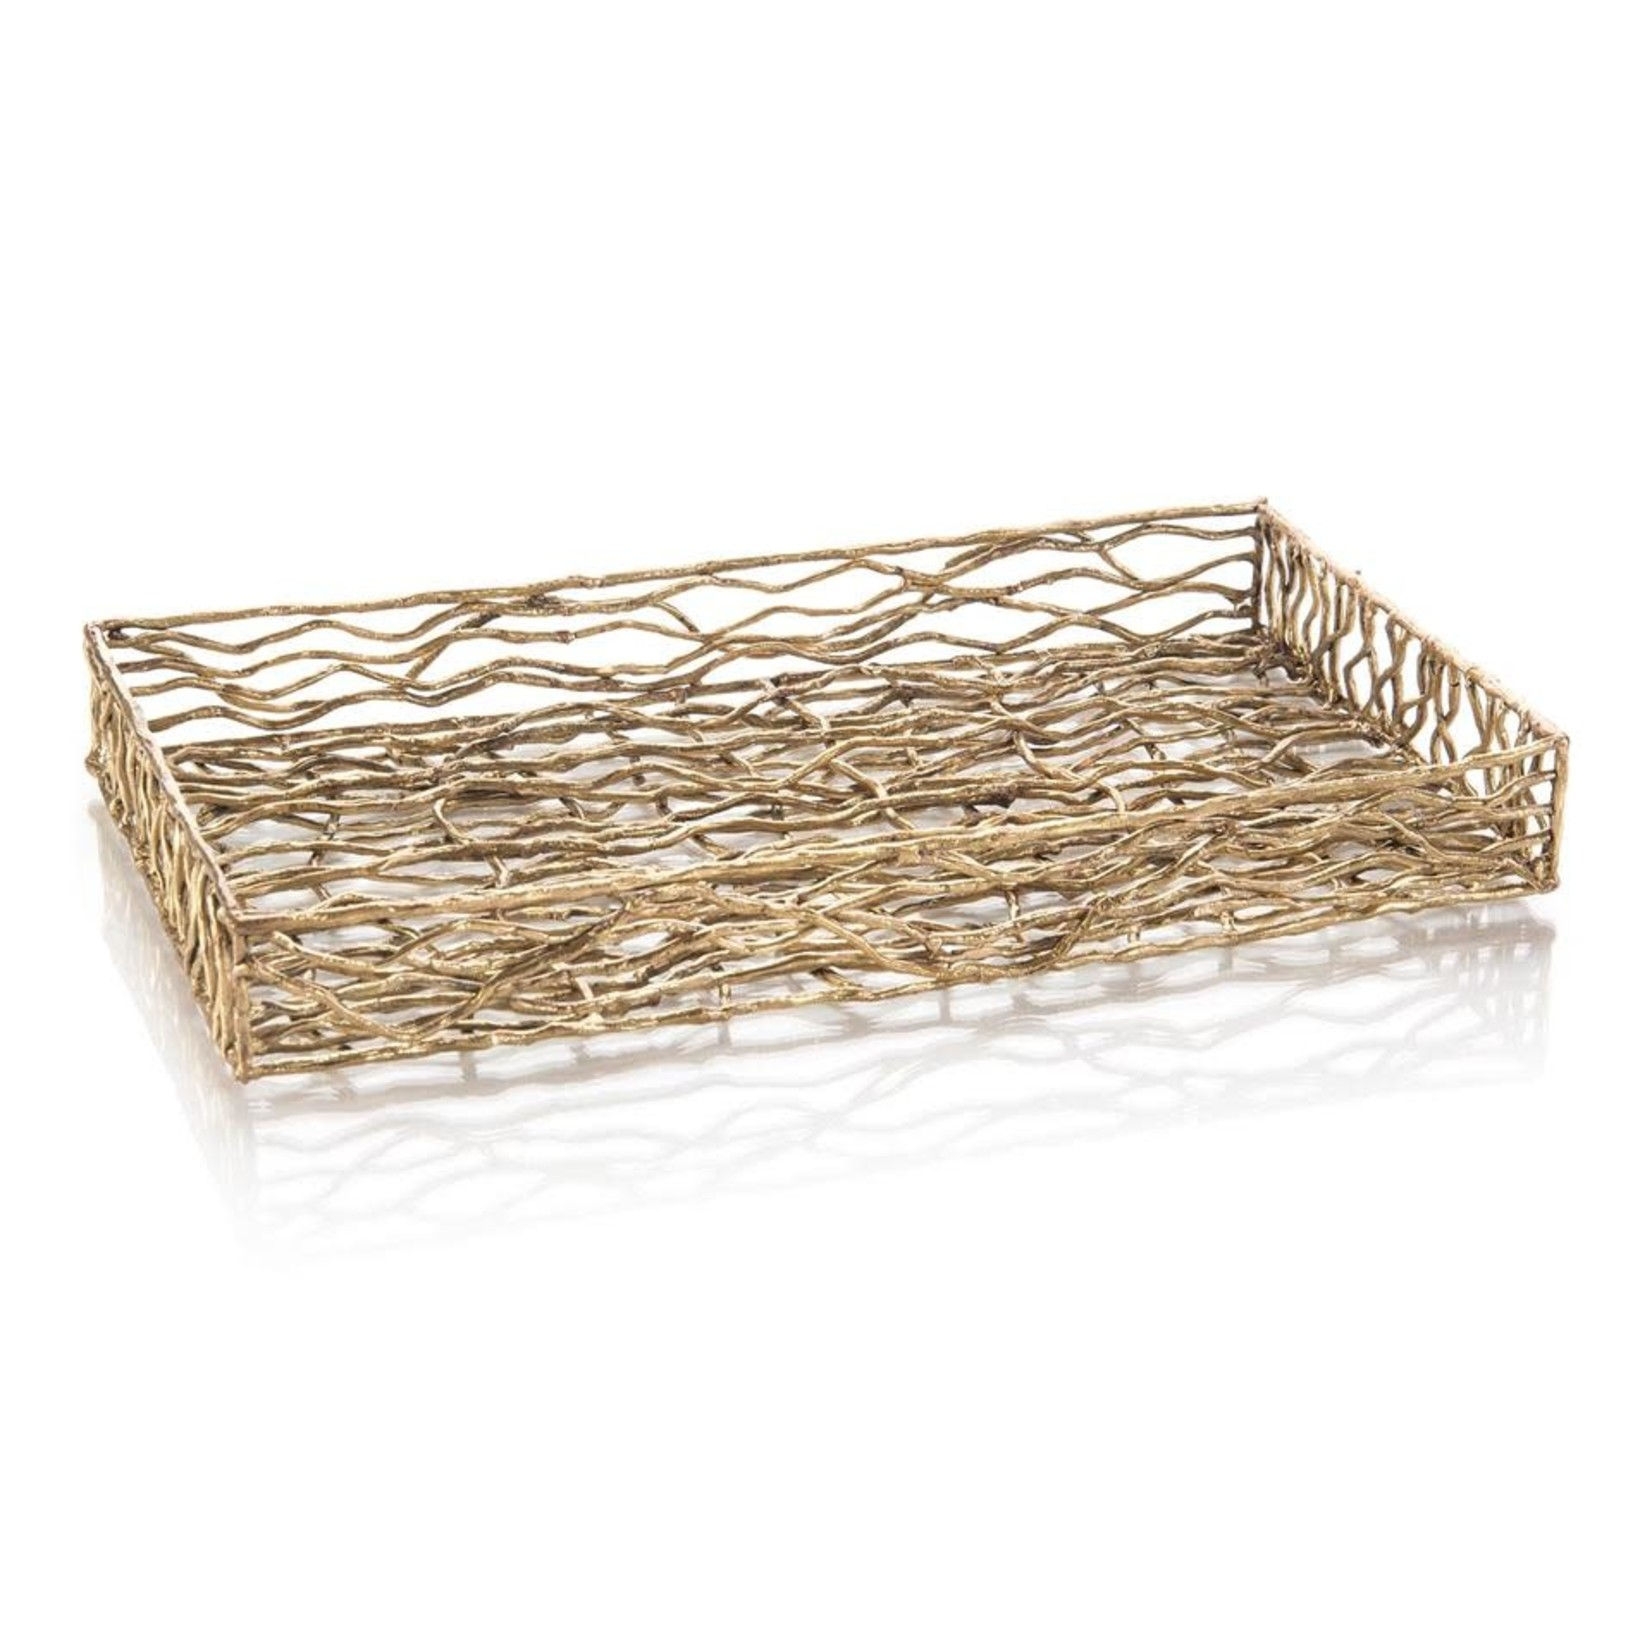 John Richard Square Basket Woven In Brass